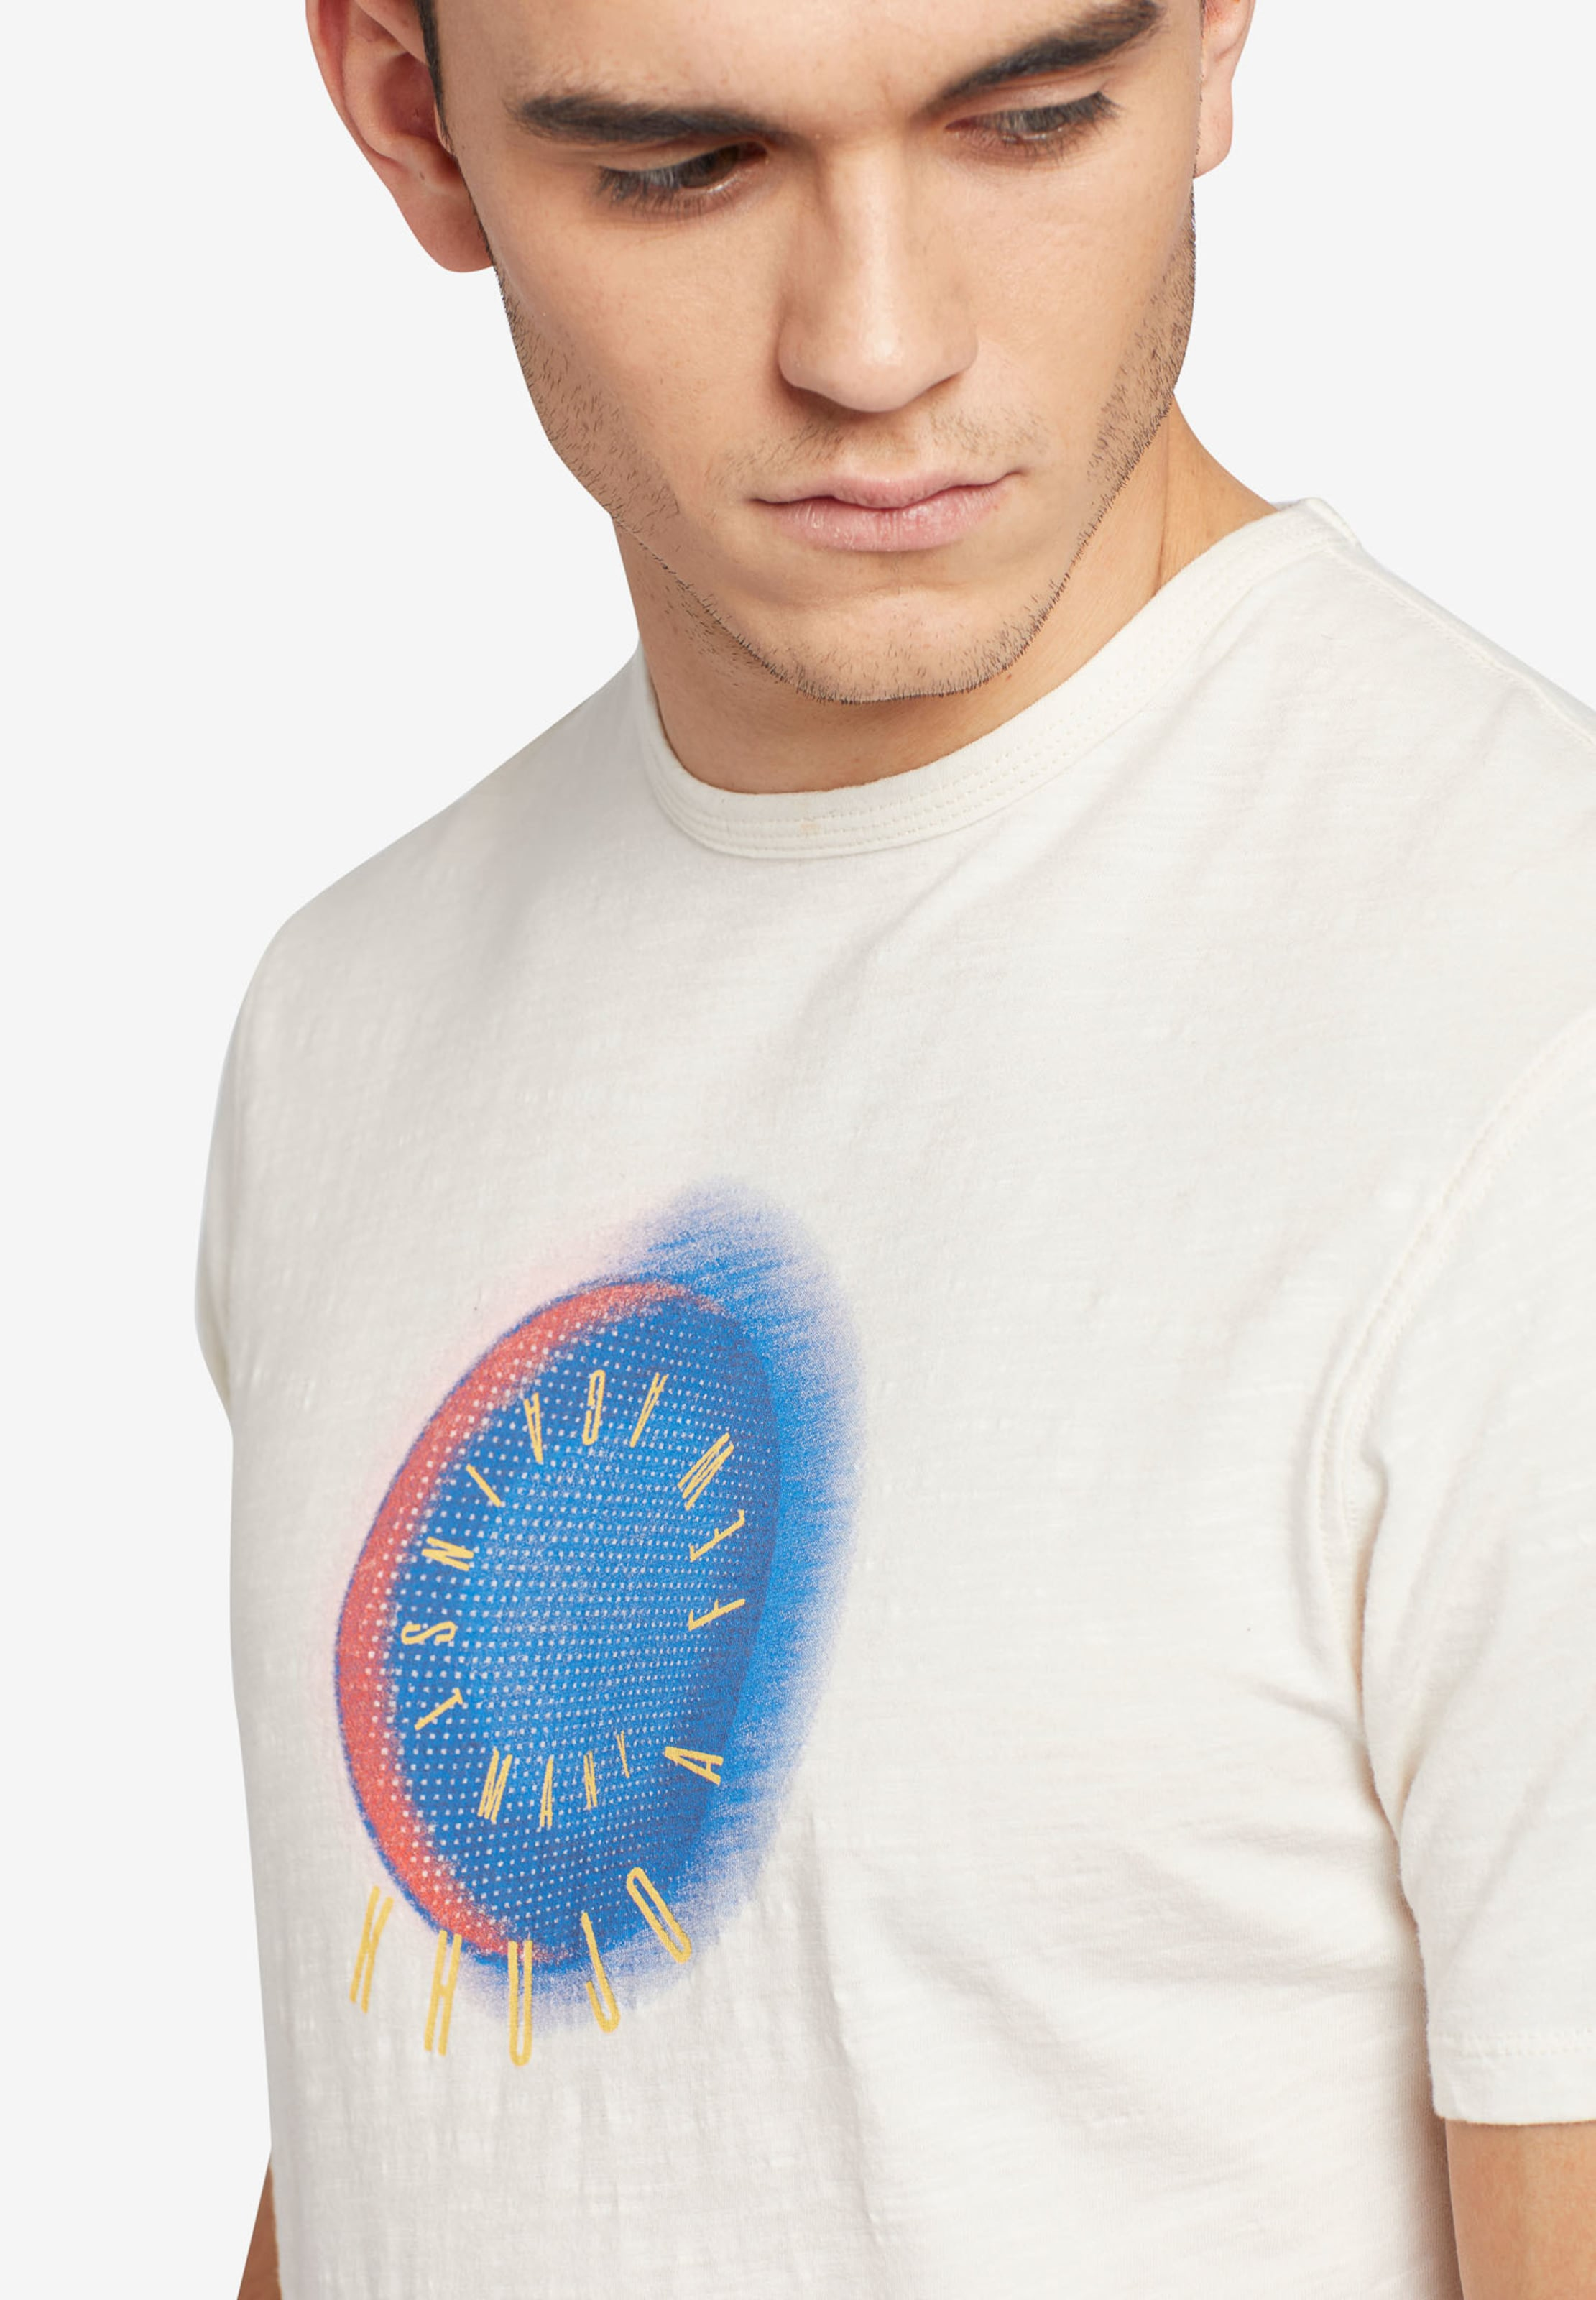 T Texture' En Khujo ClairBlanc Finn shirt Bleu ' zpVMqSU